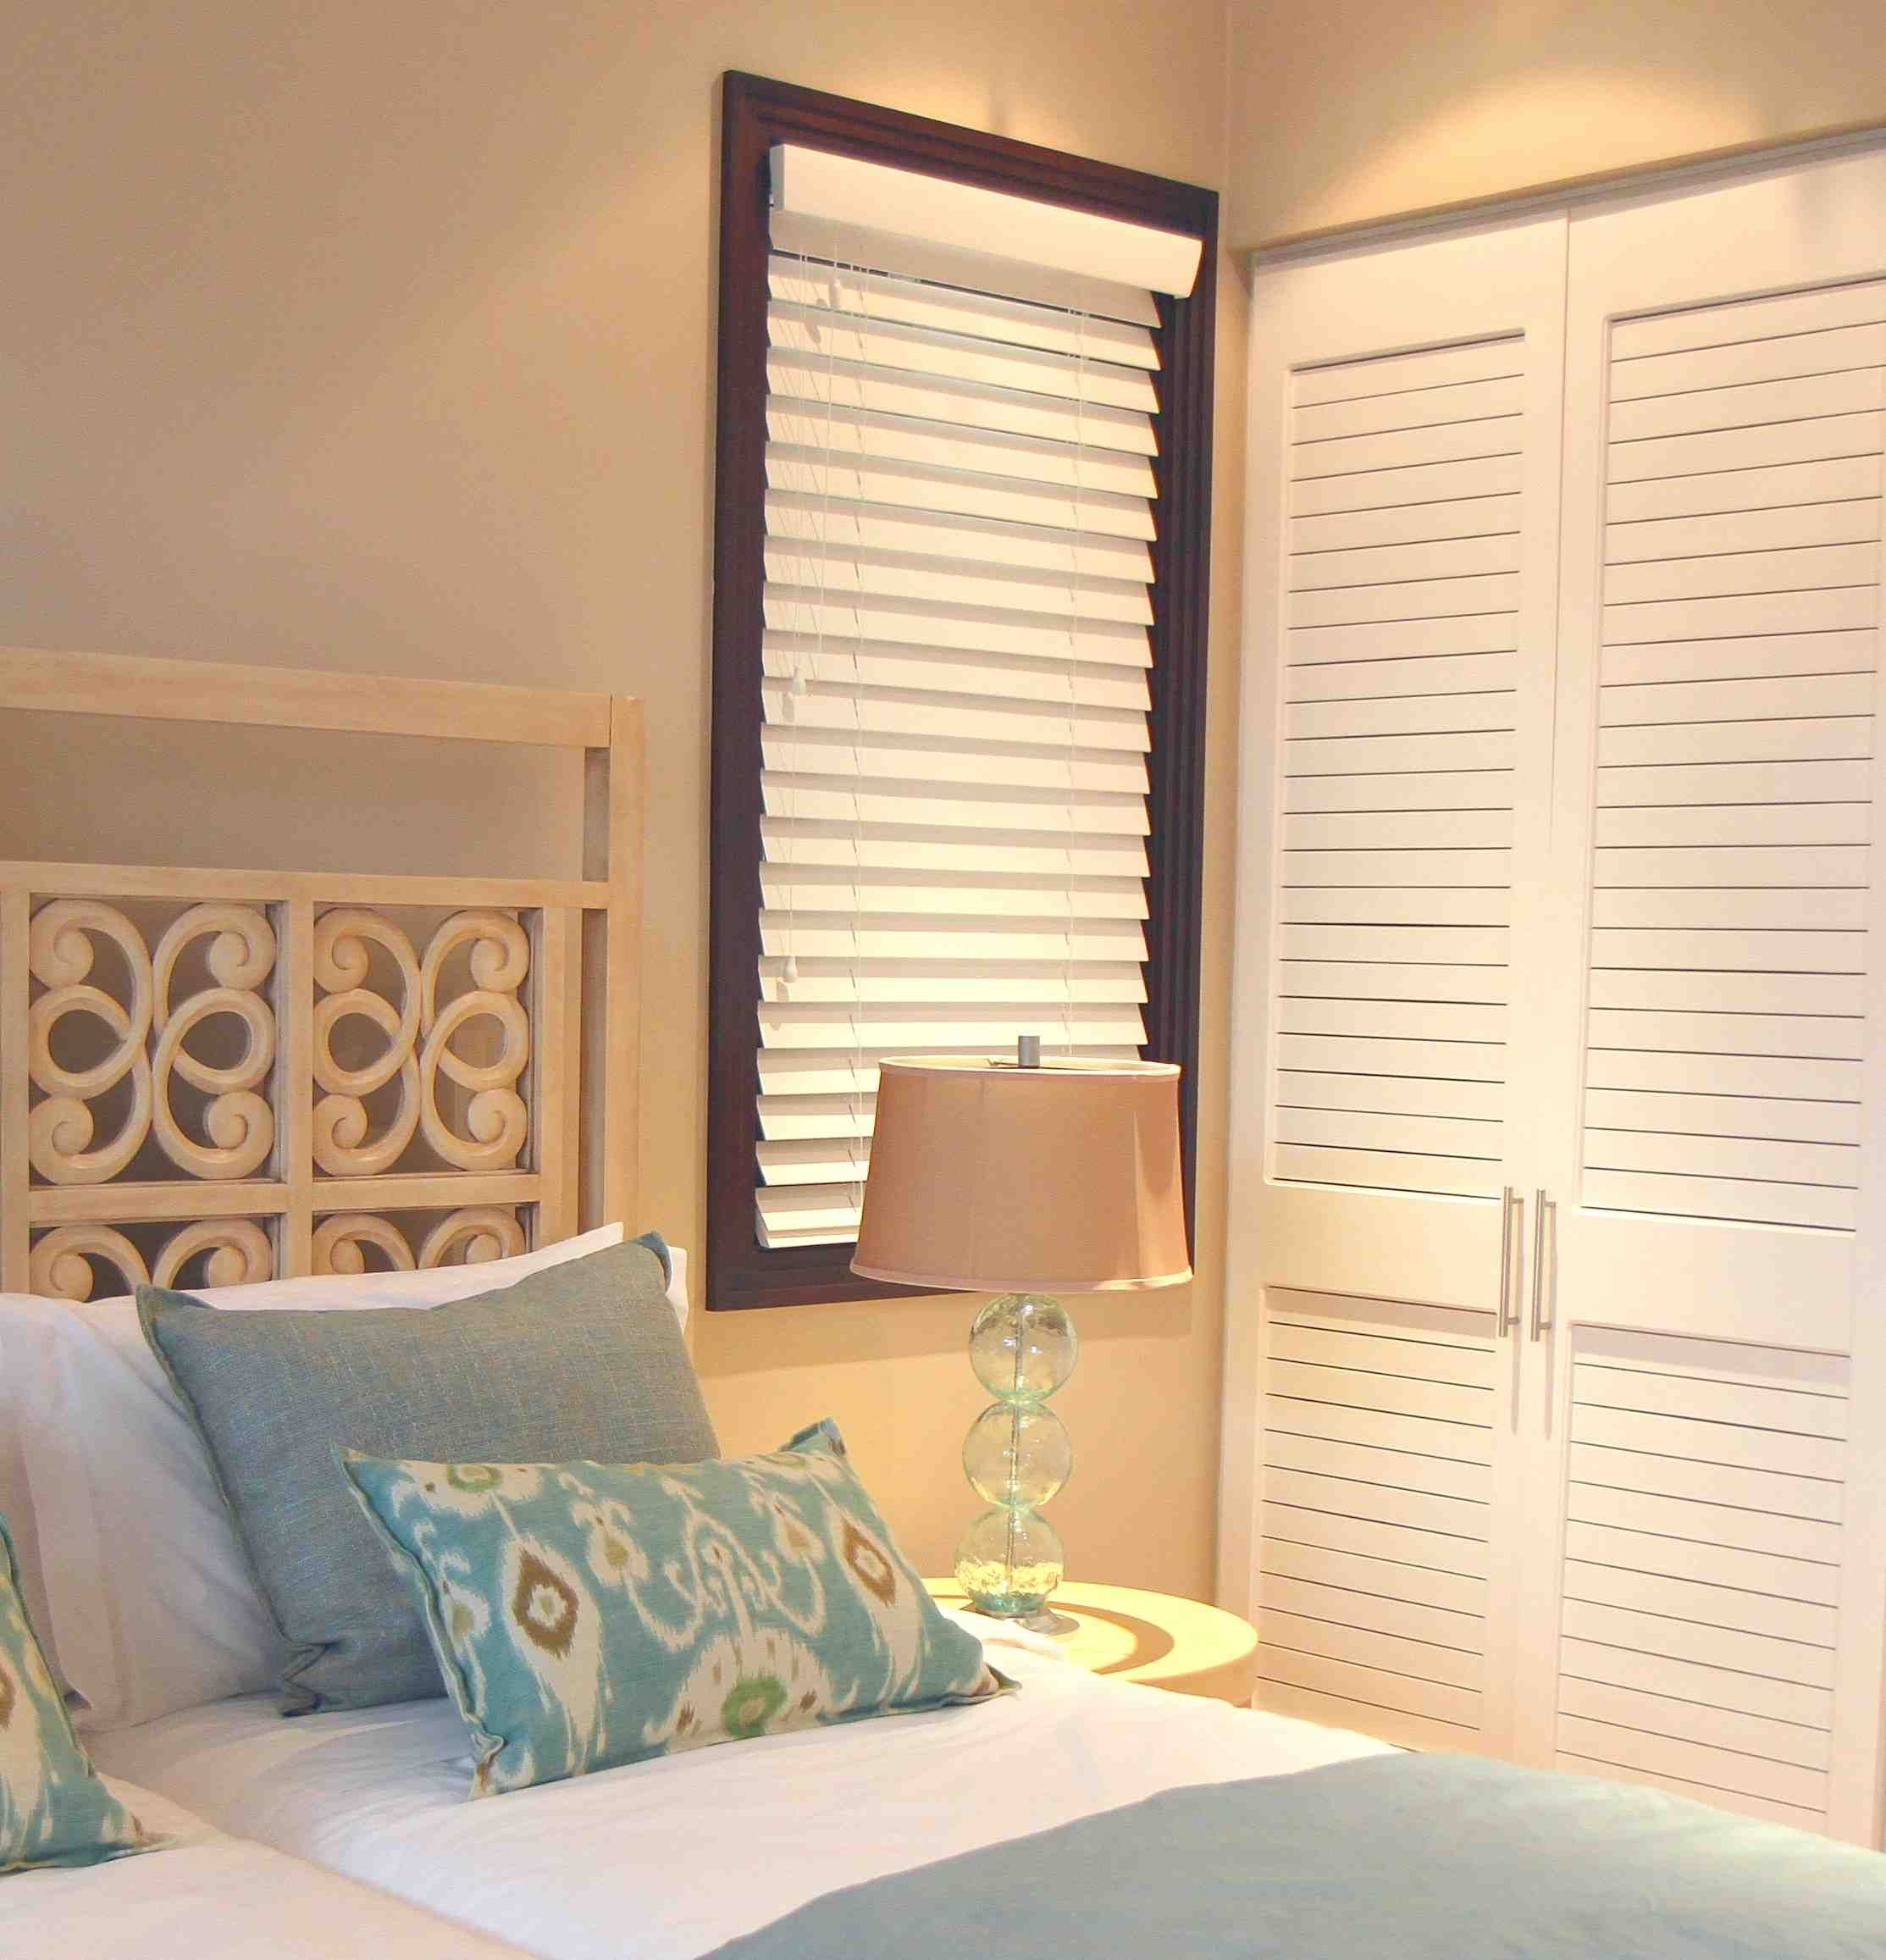 Window coverings shutters  bedroom blinds  american shutters  blinds shutters  pinterest